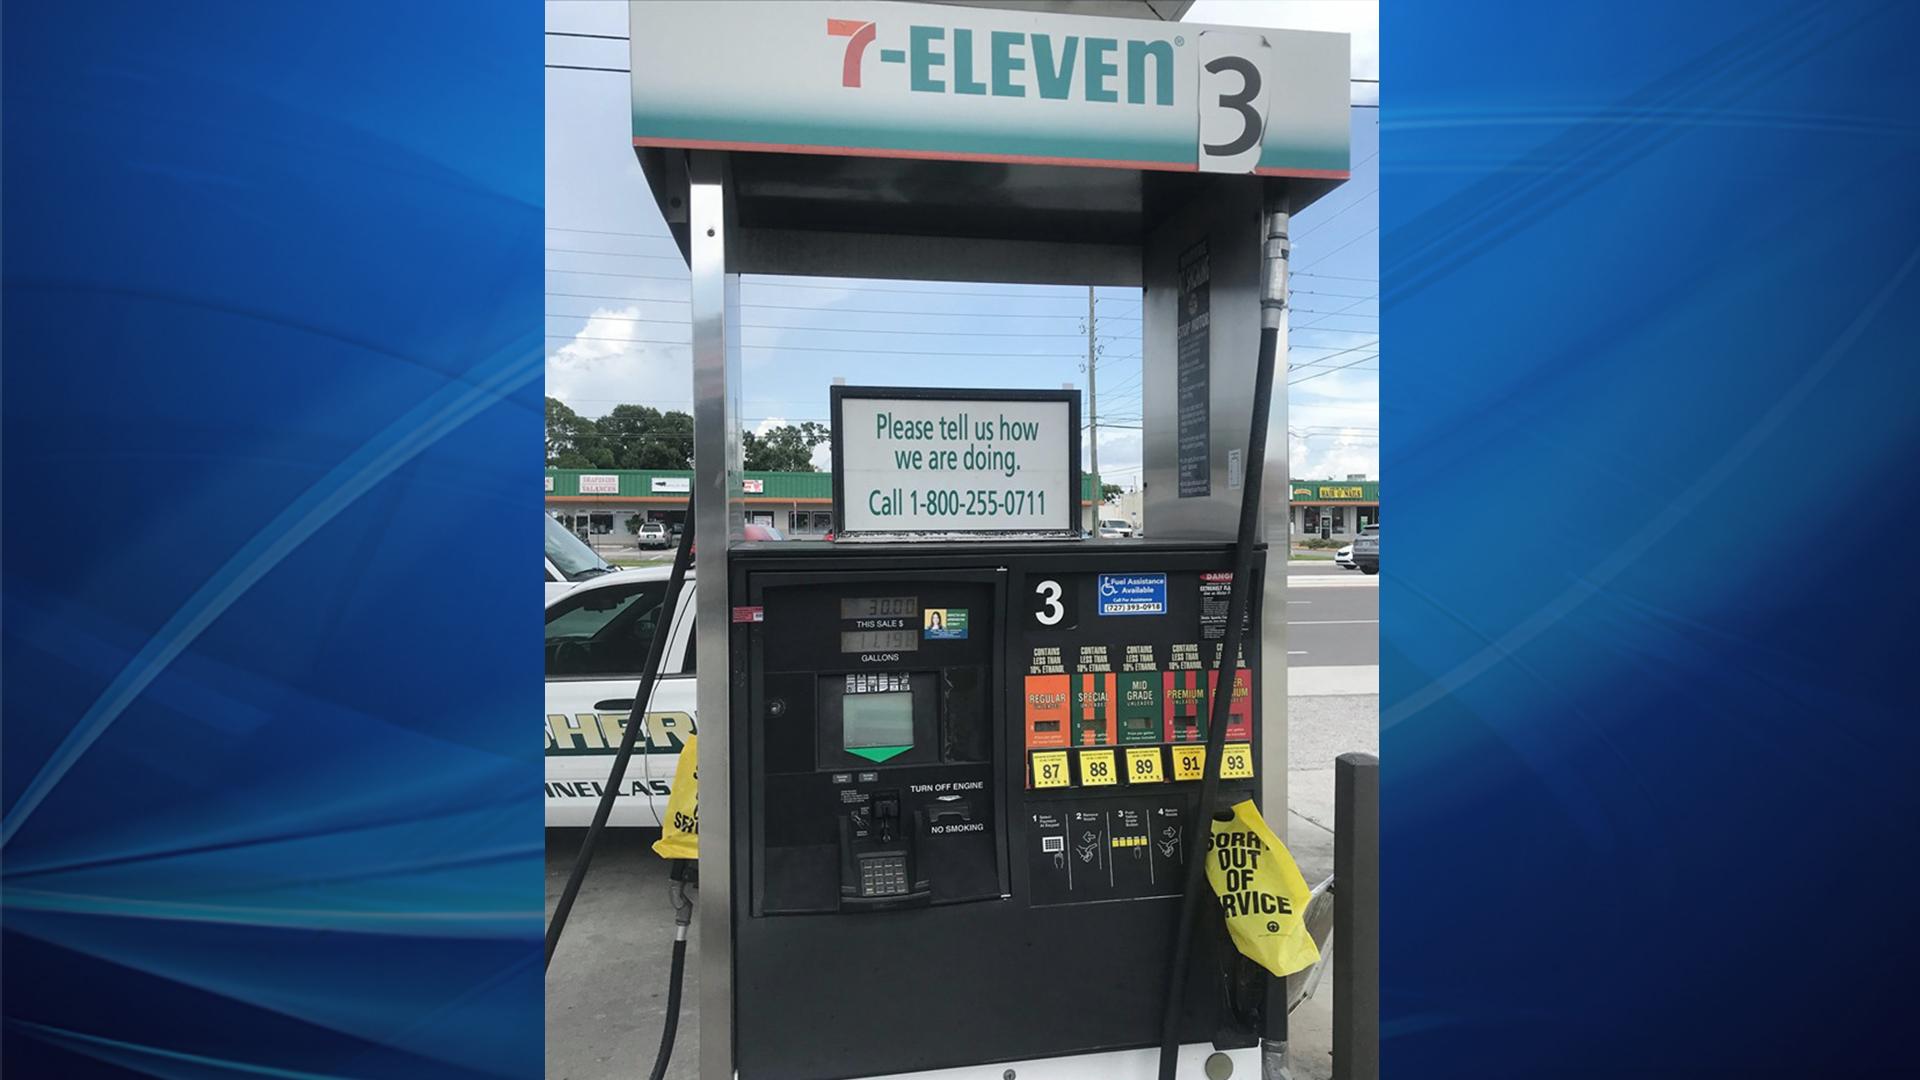 Deputies warn of Bluetooth skimmers found at 7-Eleven in